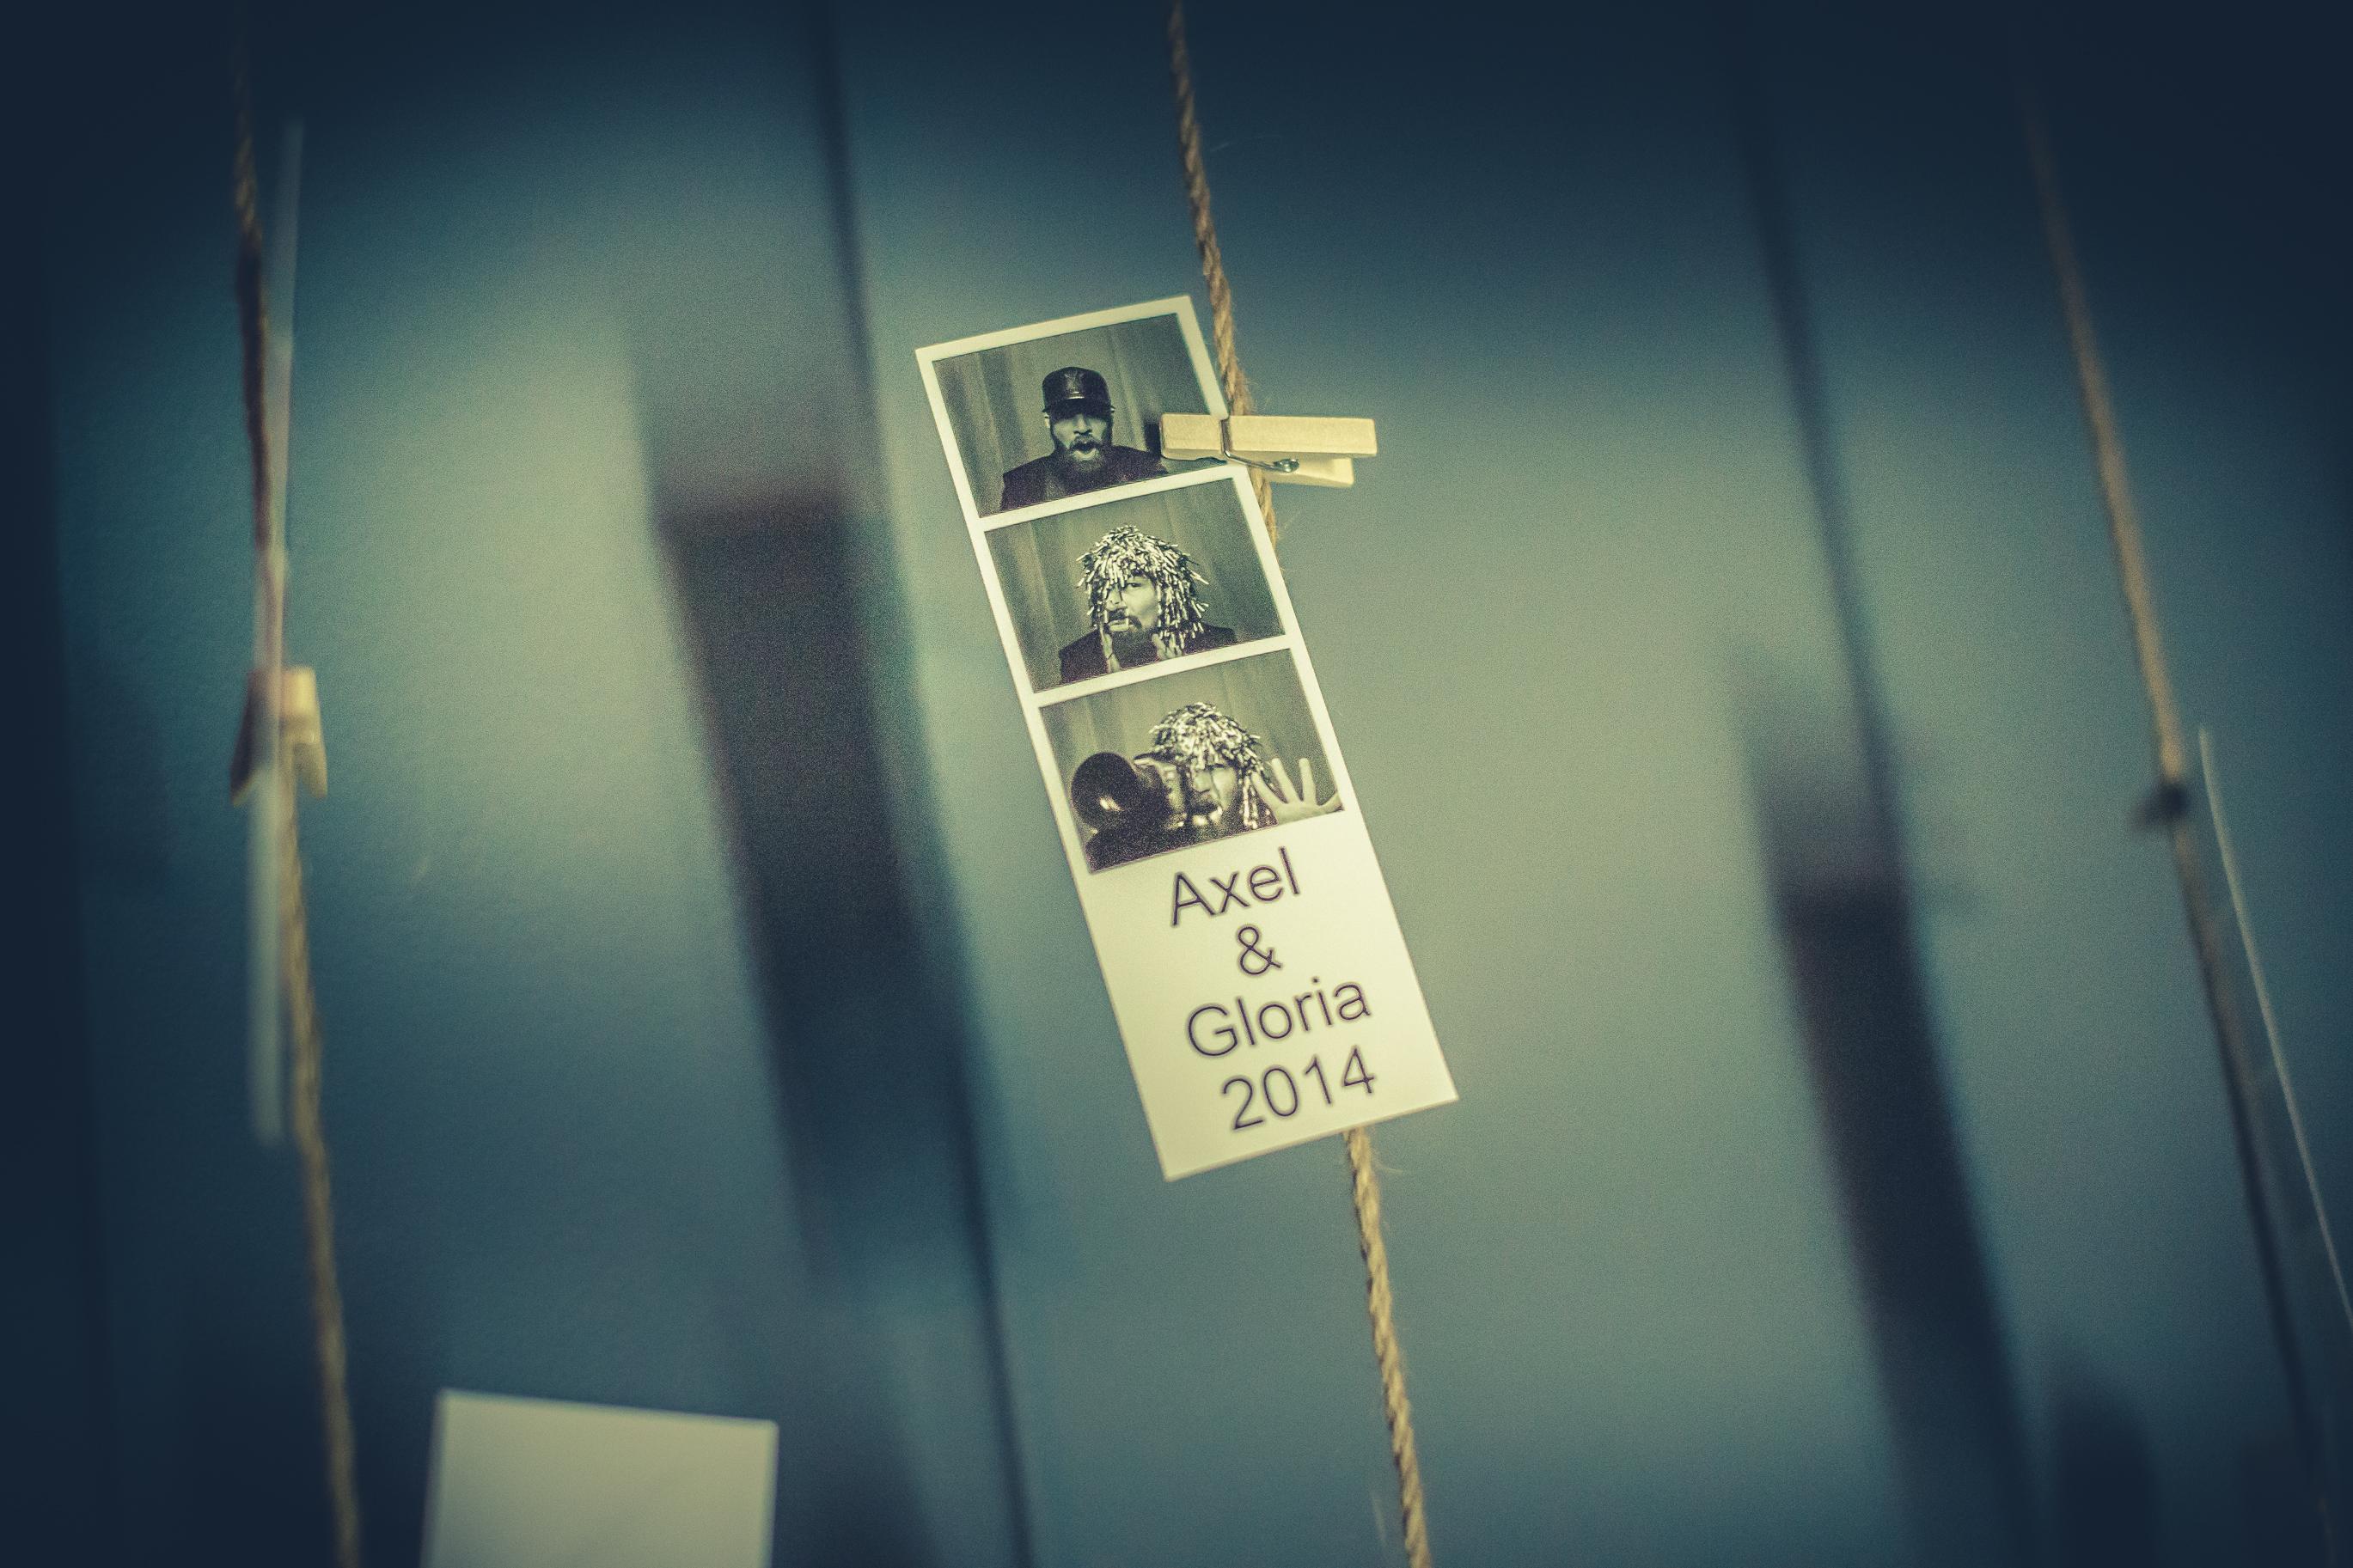 AXEL-GLORIA-5412